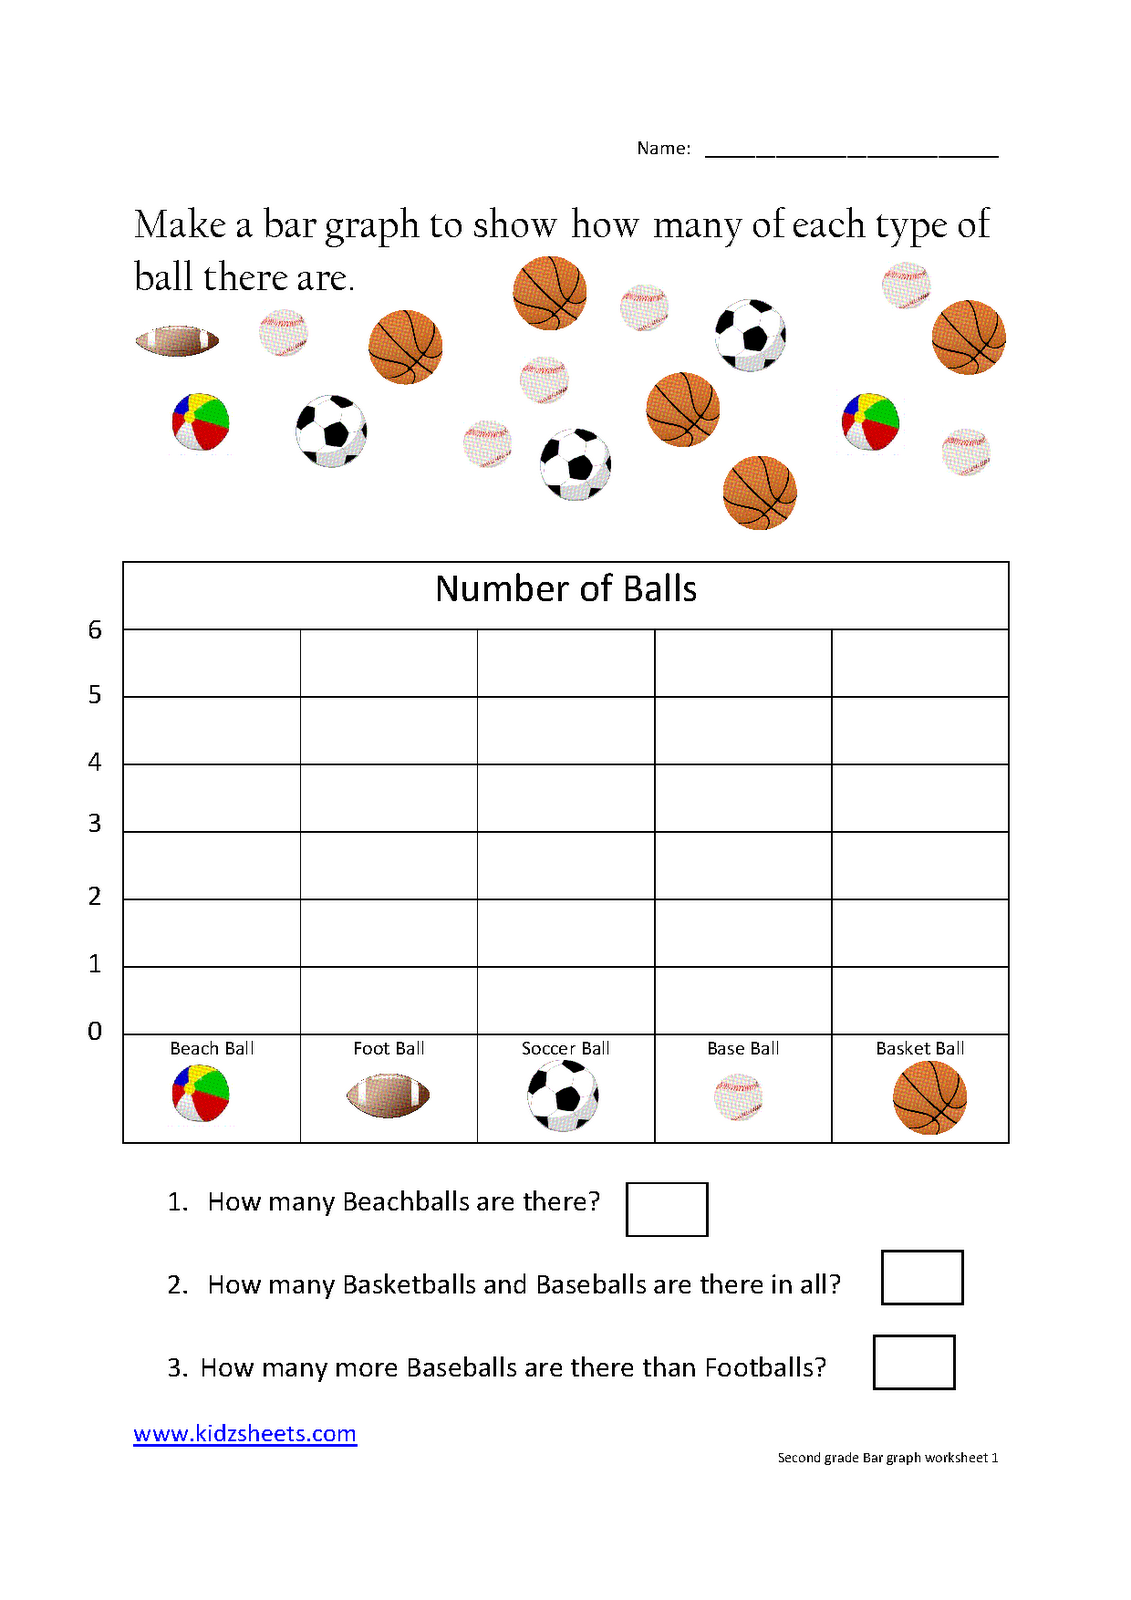 hight resolution of Kidz Worksheets: Second Grade Bar Graph Worksheet1   Kids math worksheets